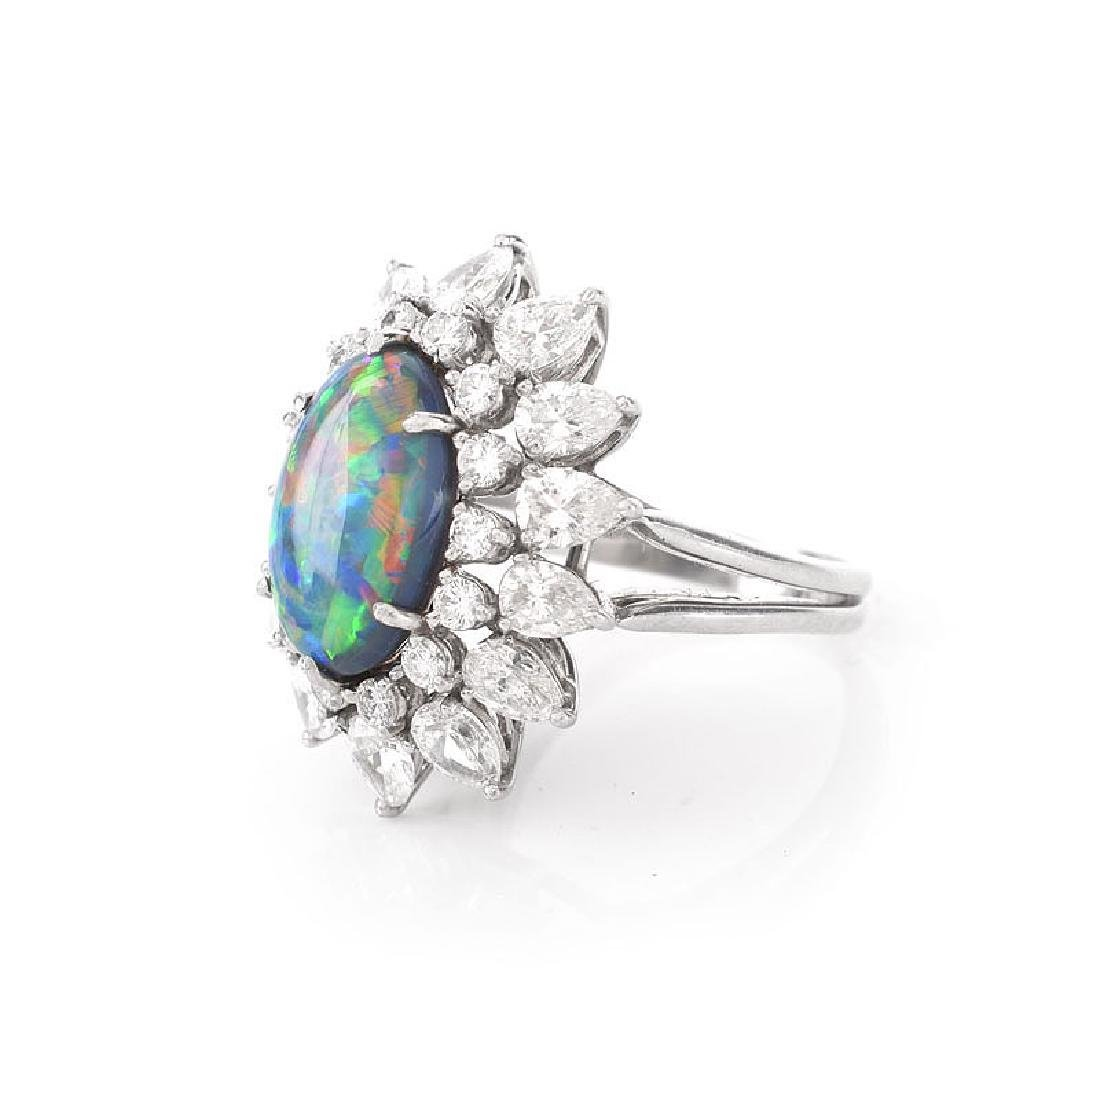 Vintage Tiffany & Co Oval Cabochon Black Opal, Pear - 2